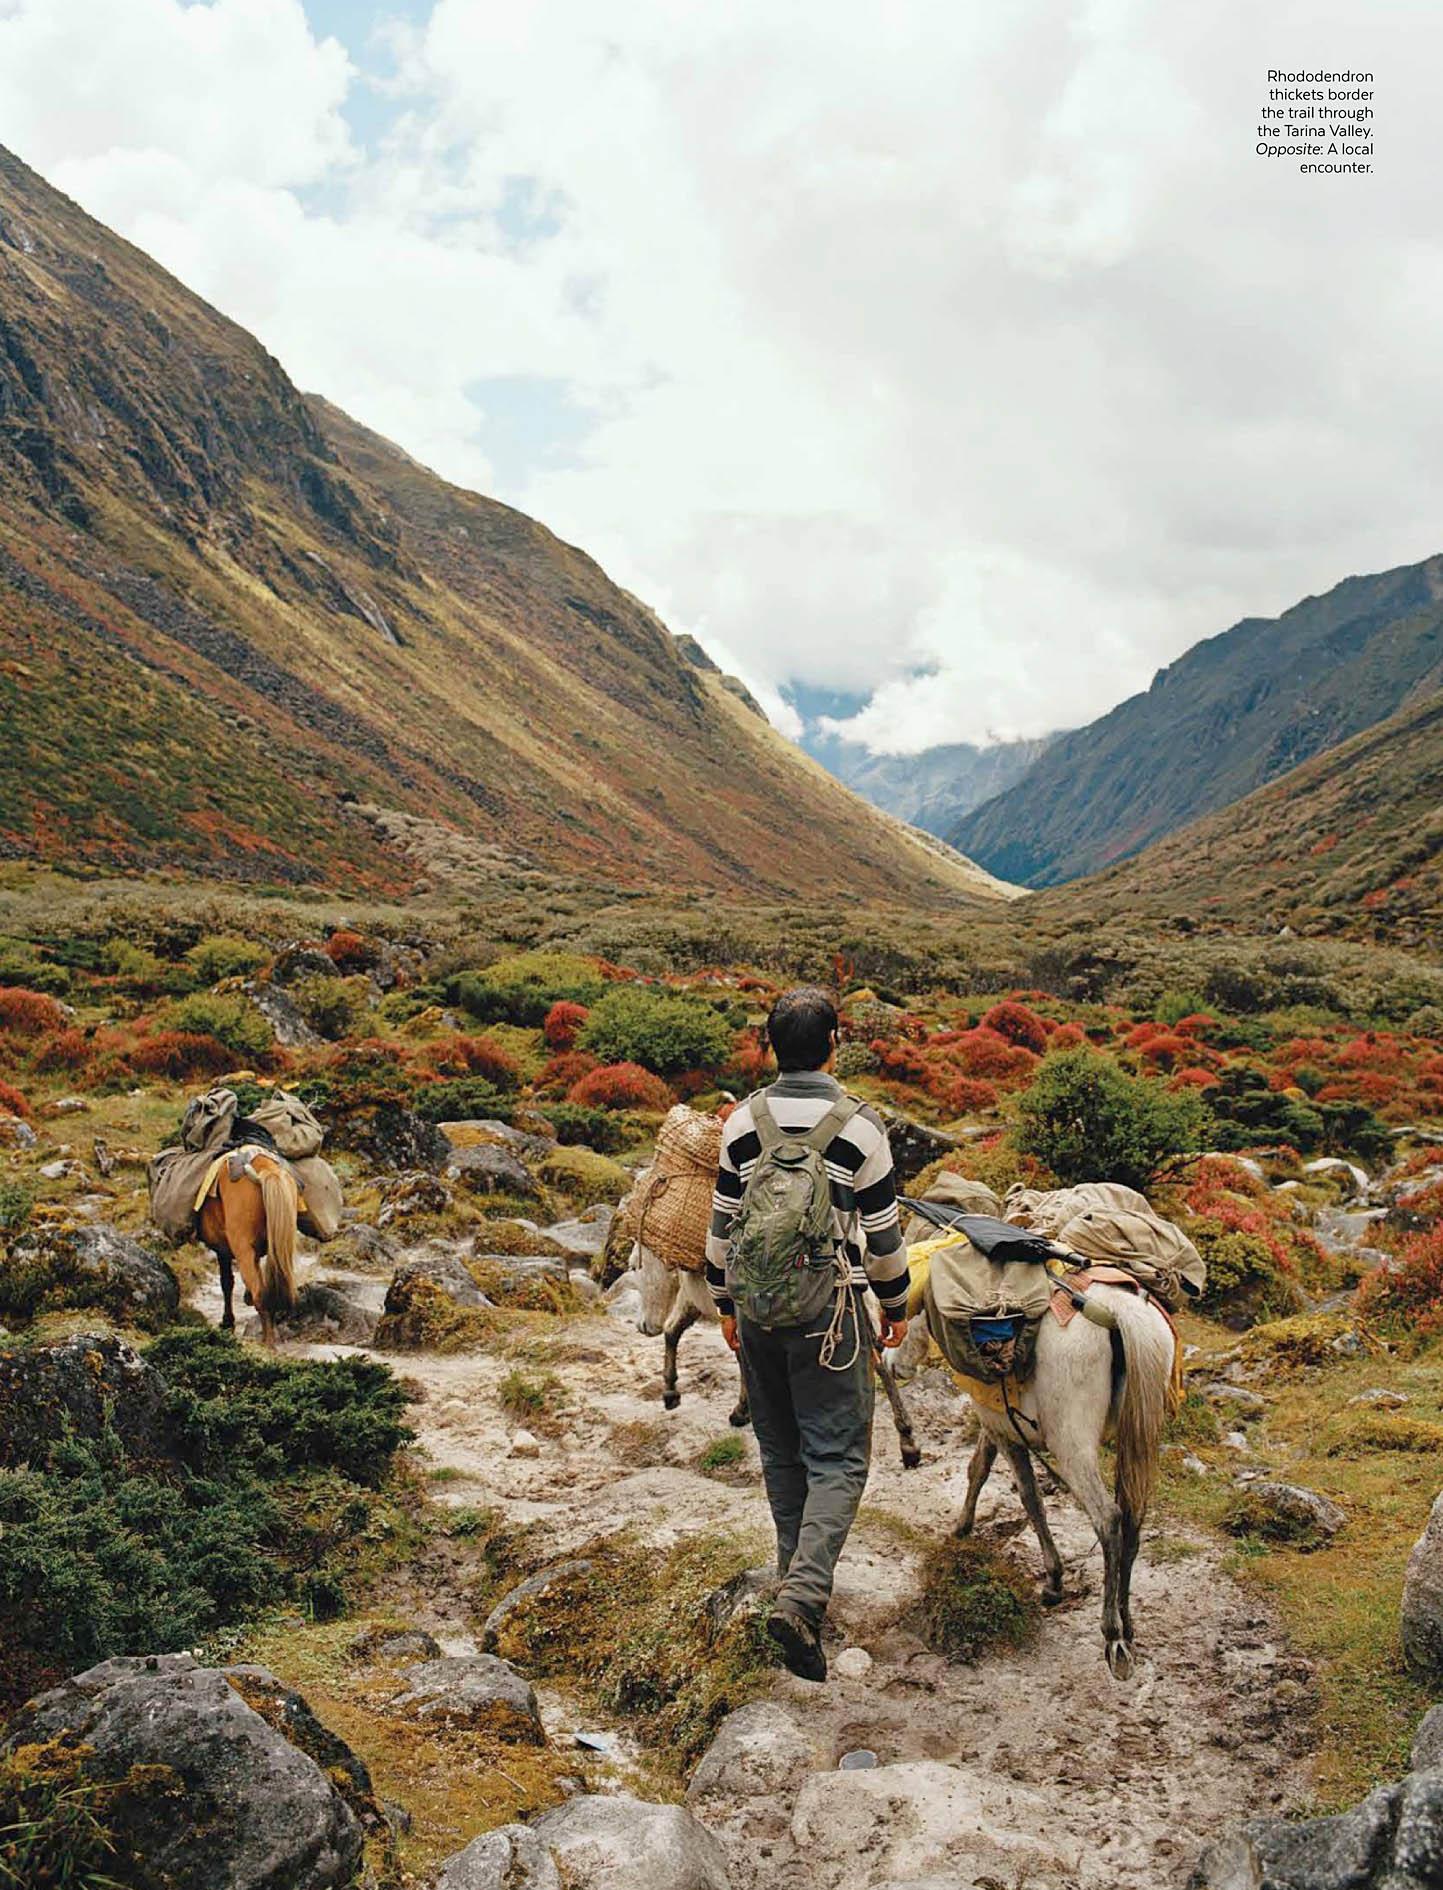 DestinAsian 2020-04-07 Bhutan 03.jpg